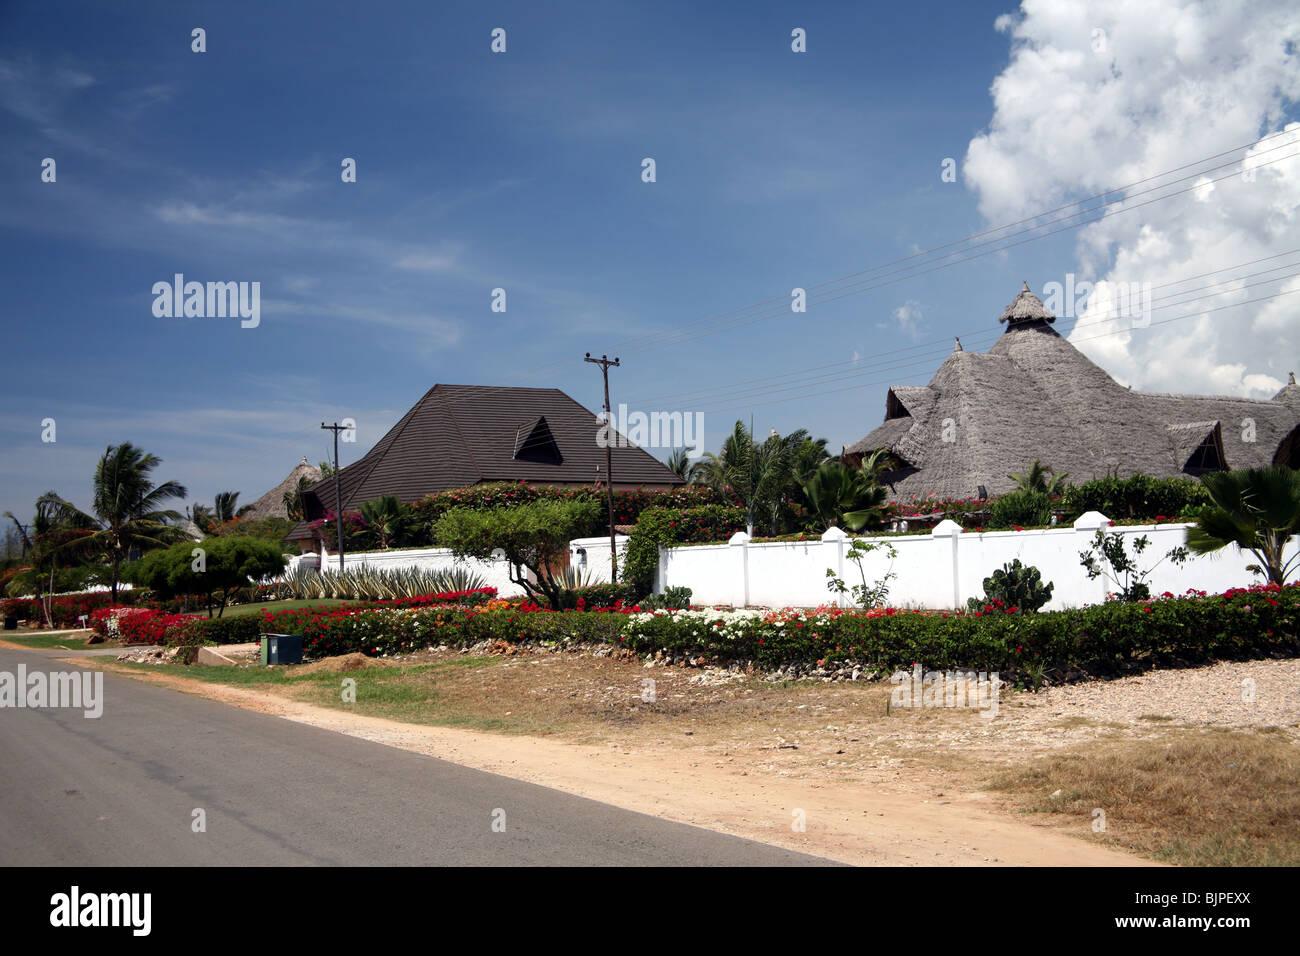 Tourist complex beach road Diani beach Kenya - Stock Image